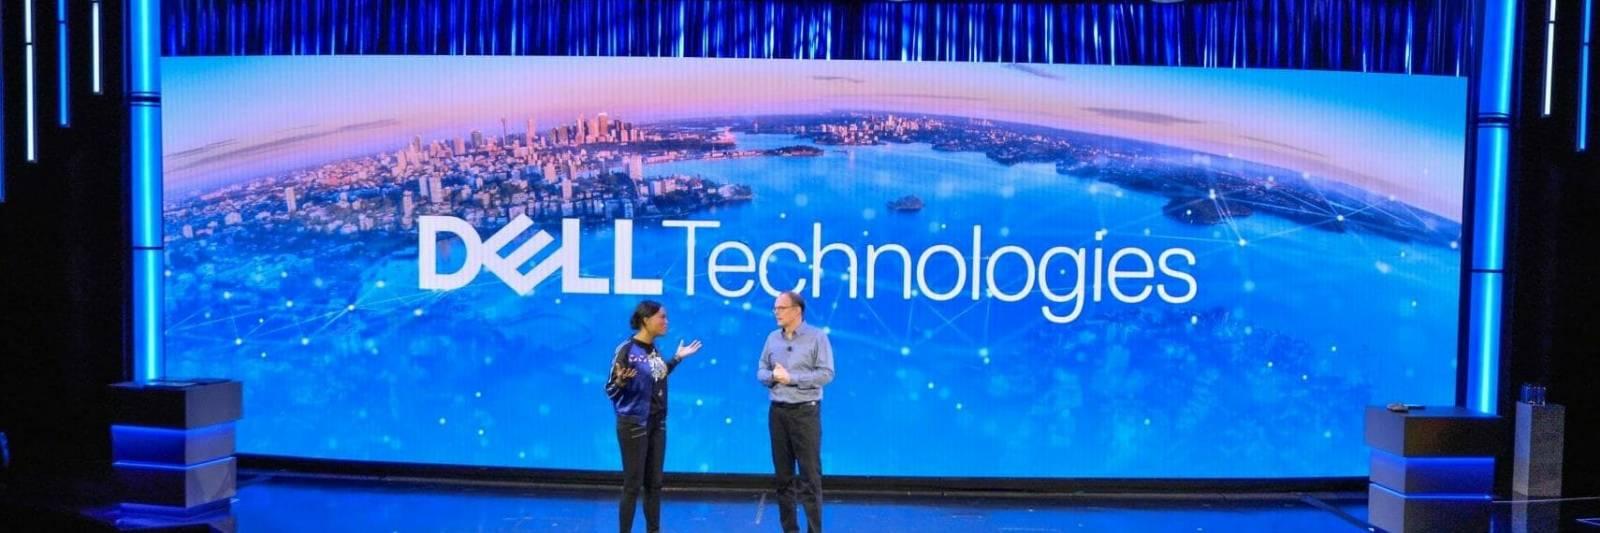 new bios vulnerabilities impact tens of millions of dell computer